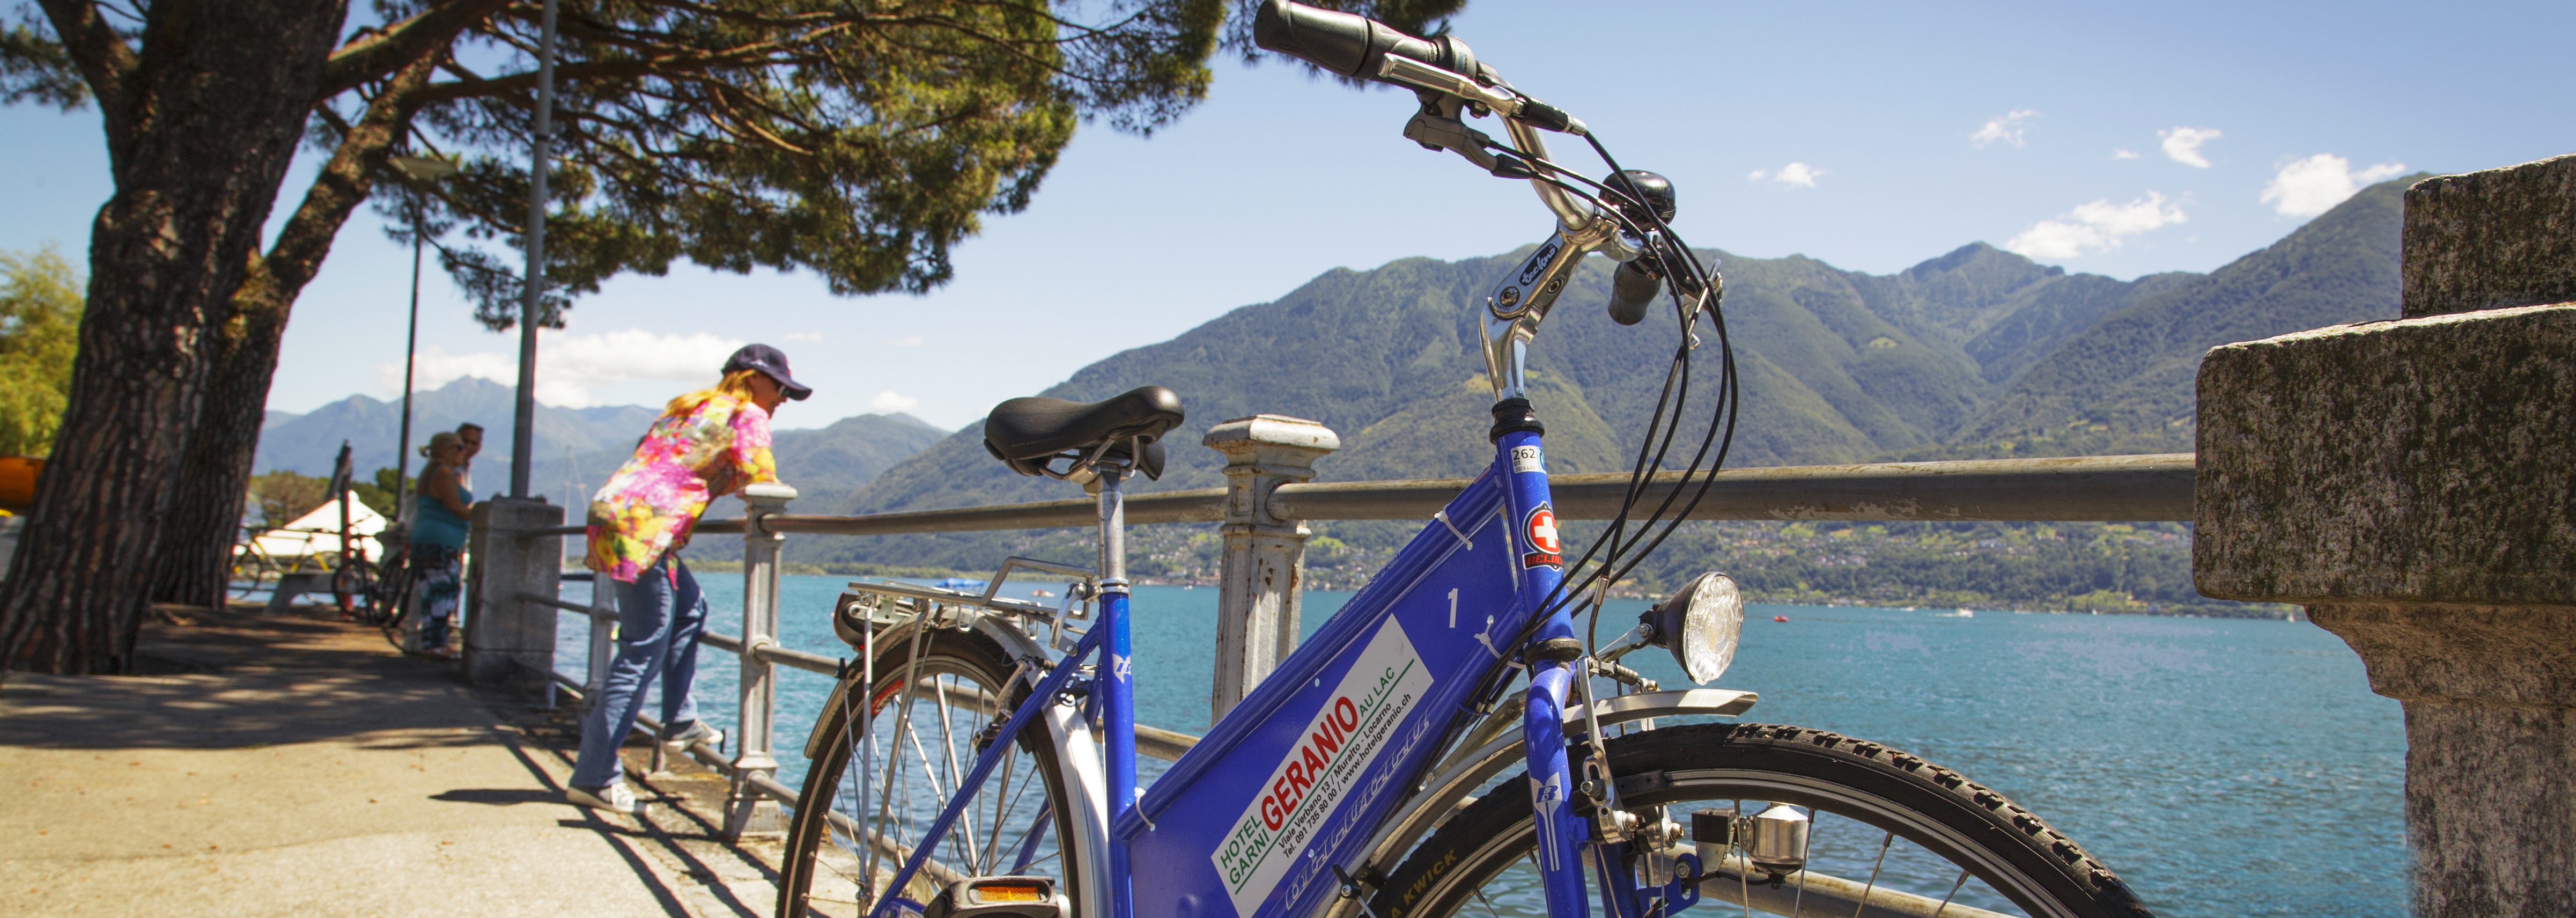 Geranio au Lac - Biciclette per i clienti